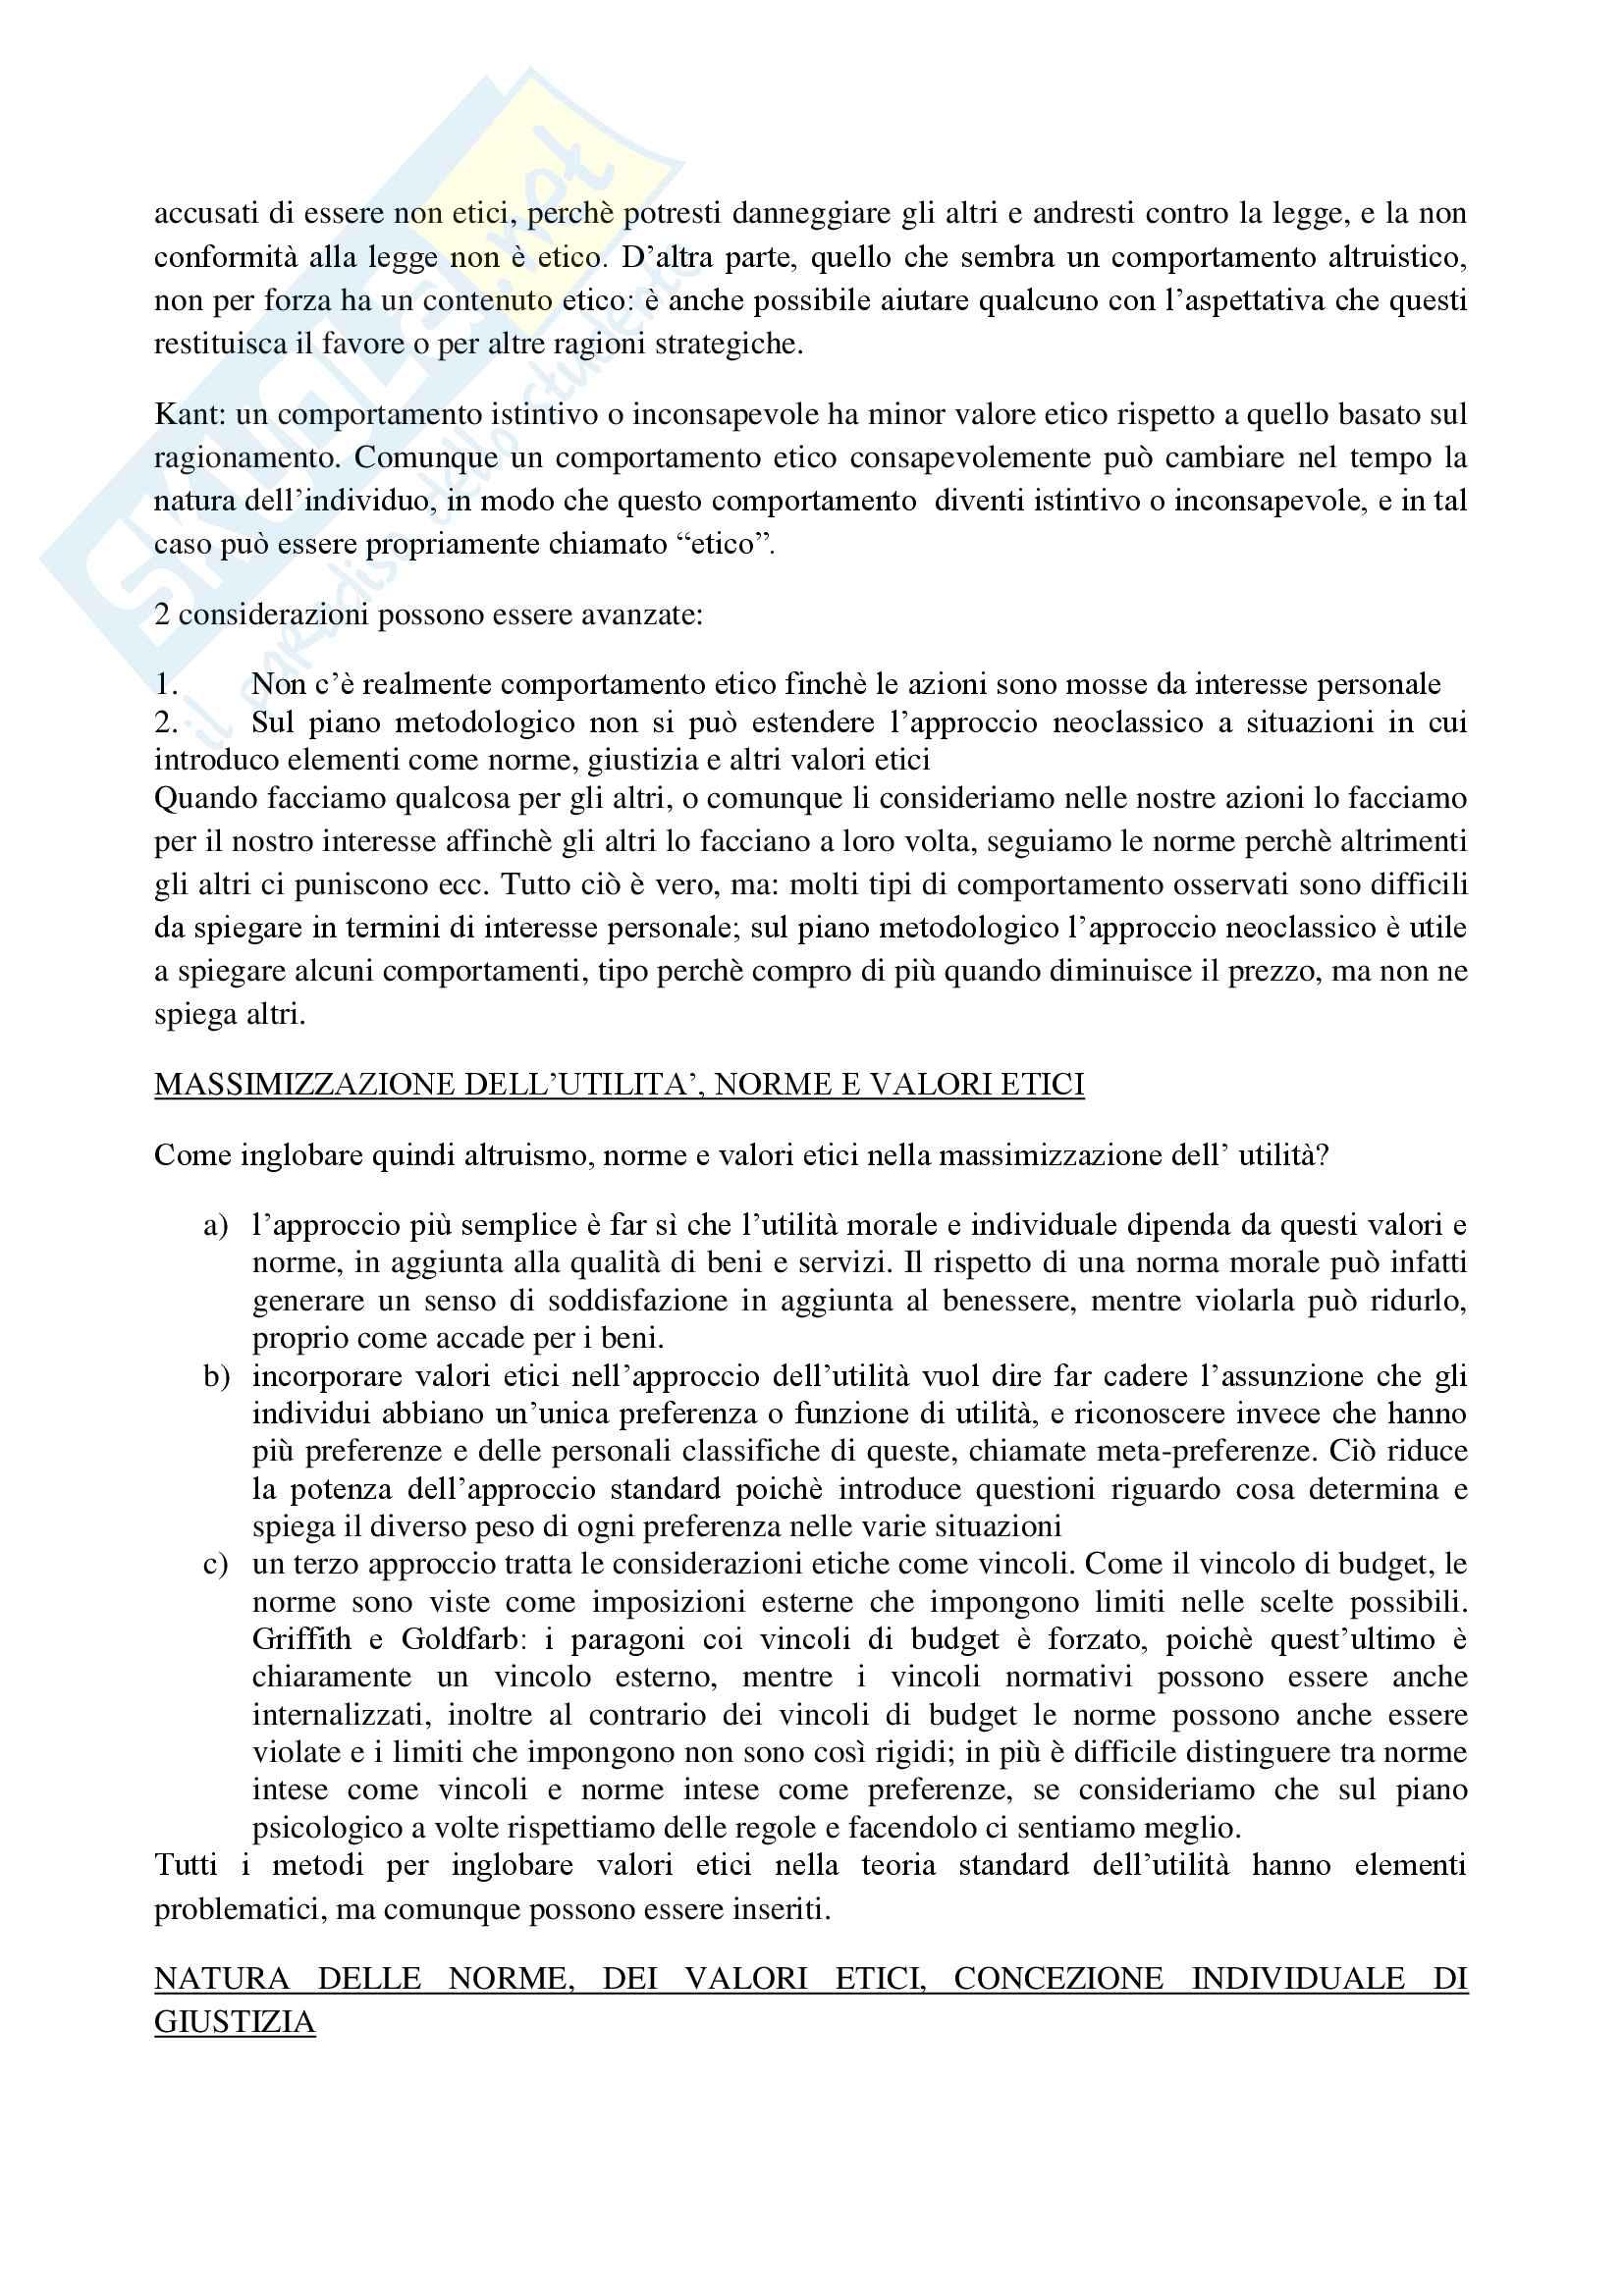 Modulo economico (De Muro) Pag. 16